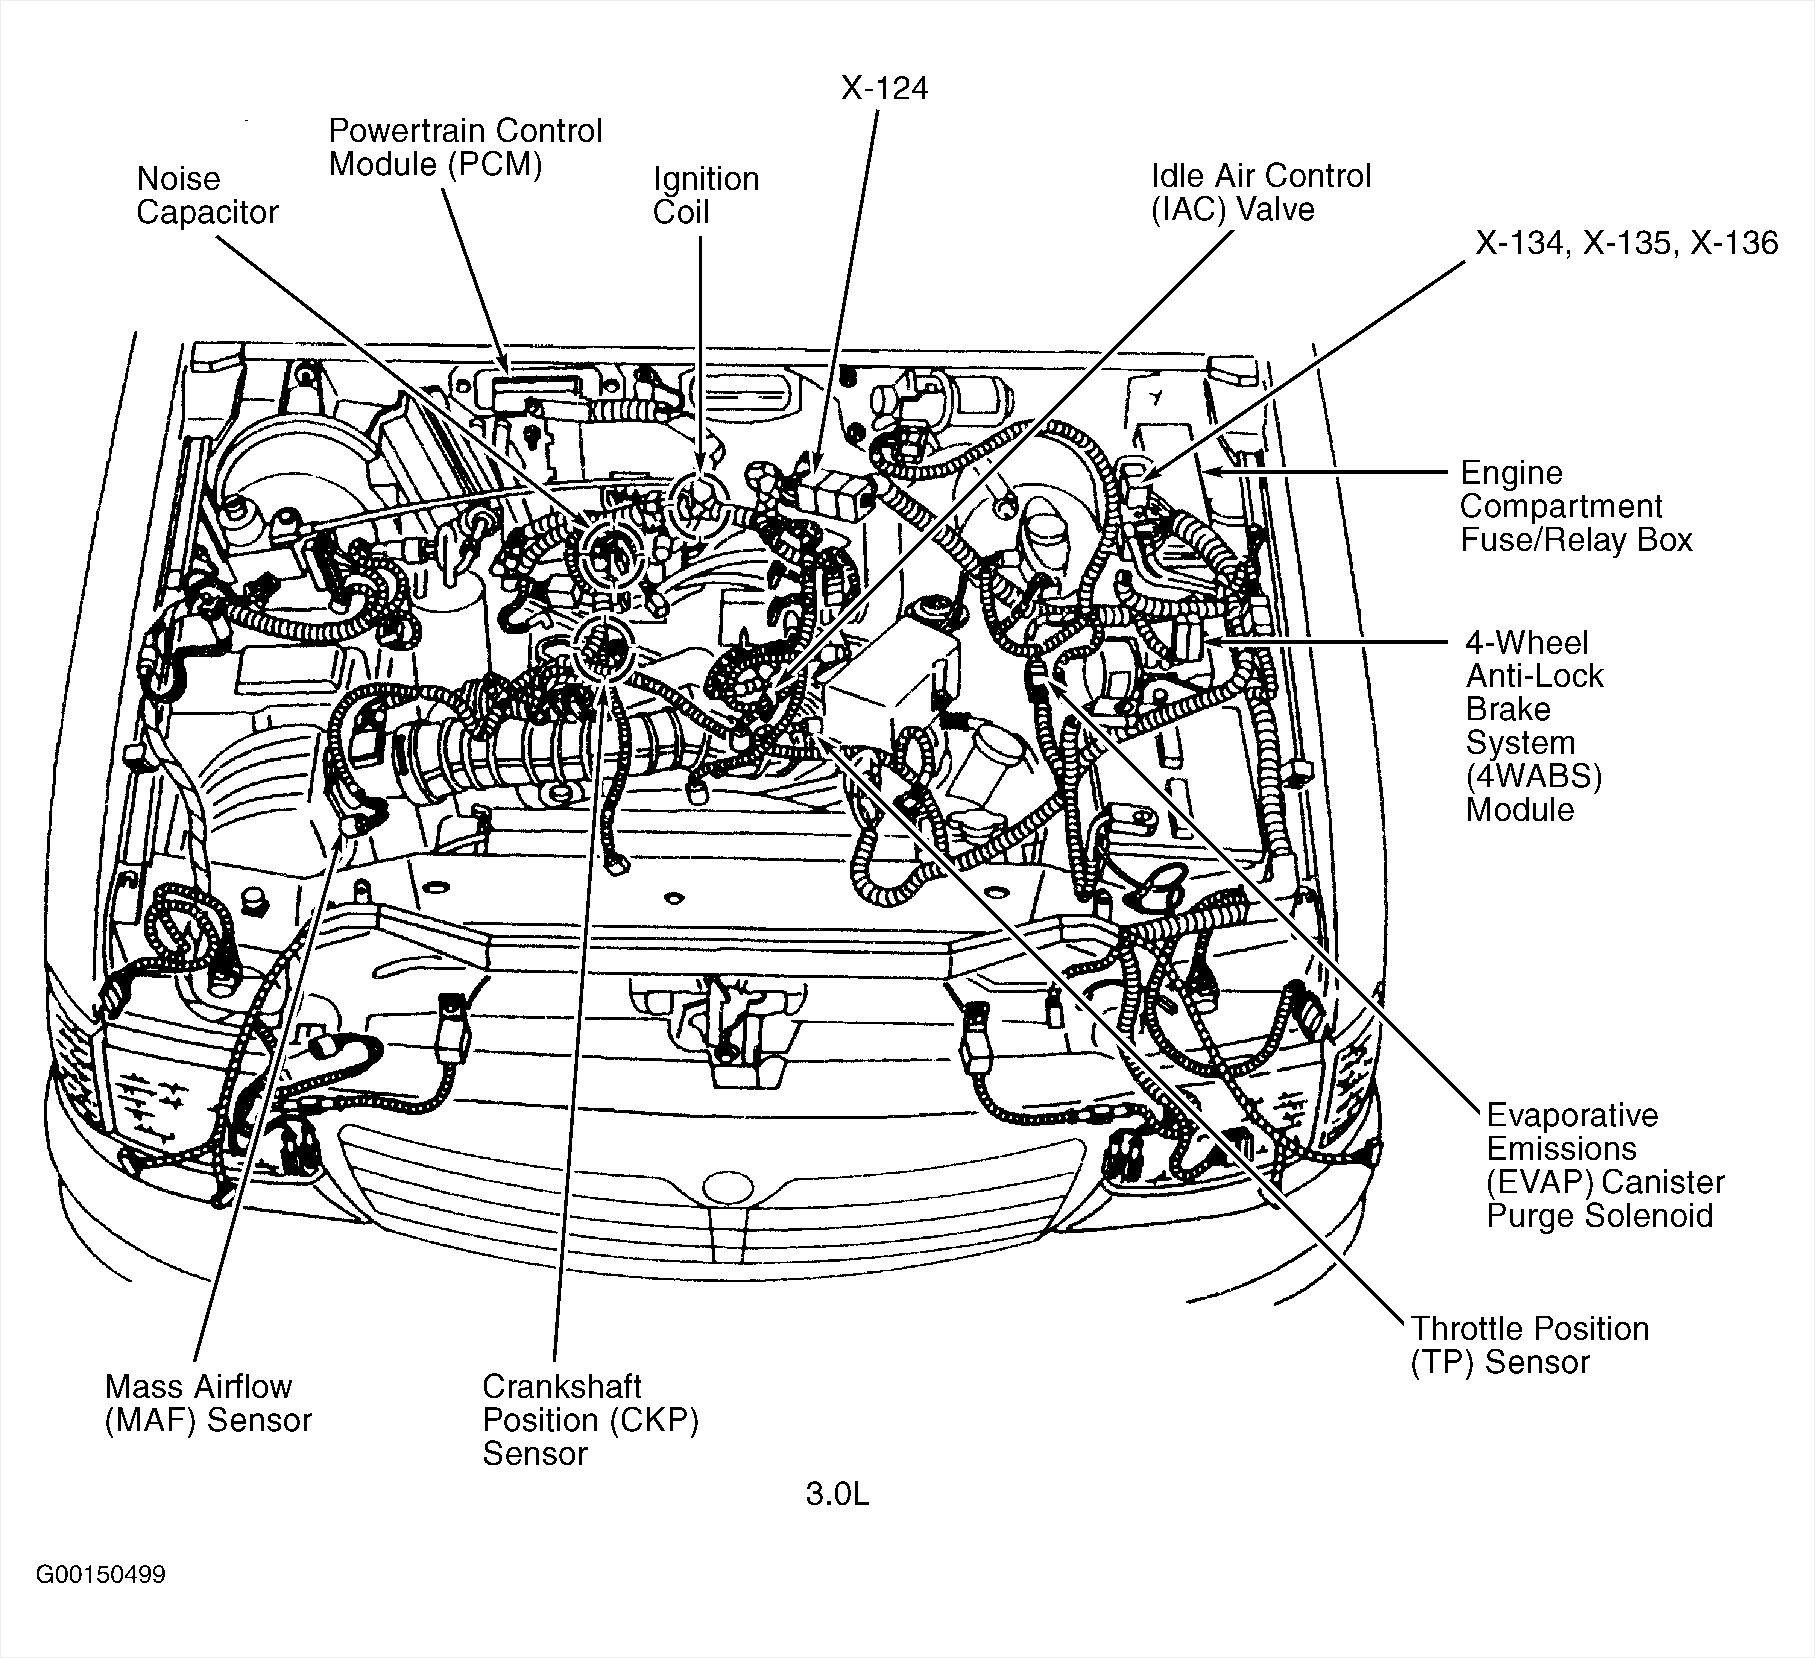 Vacuum Hose Routing Diagram 1986 ford F150 33 ford 60 Diesel Vacuum Line Diagram Wiring Diagram Full Of Vacuum Hose Routing Diagram 1986 ford F150